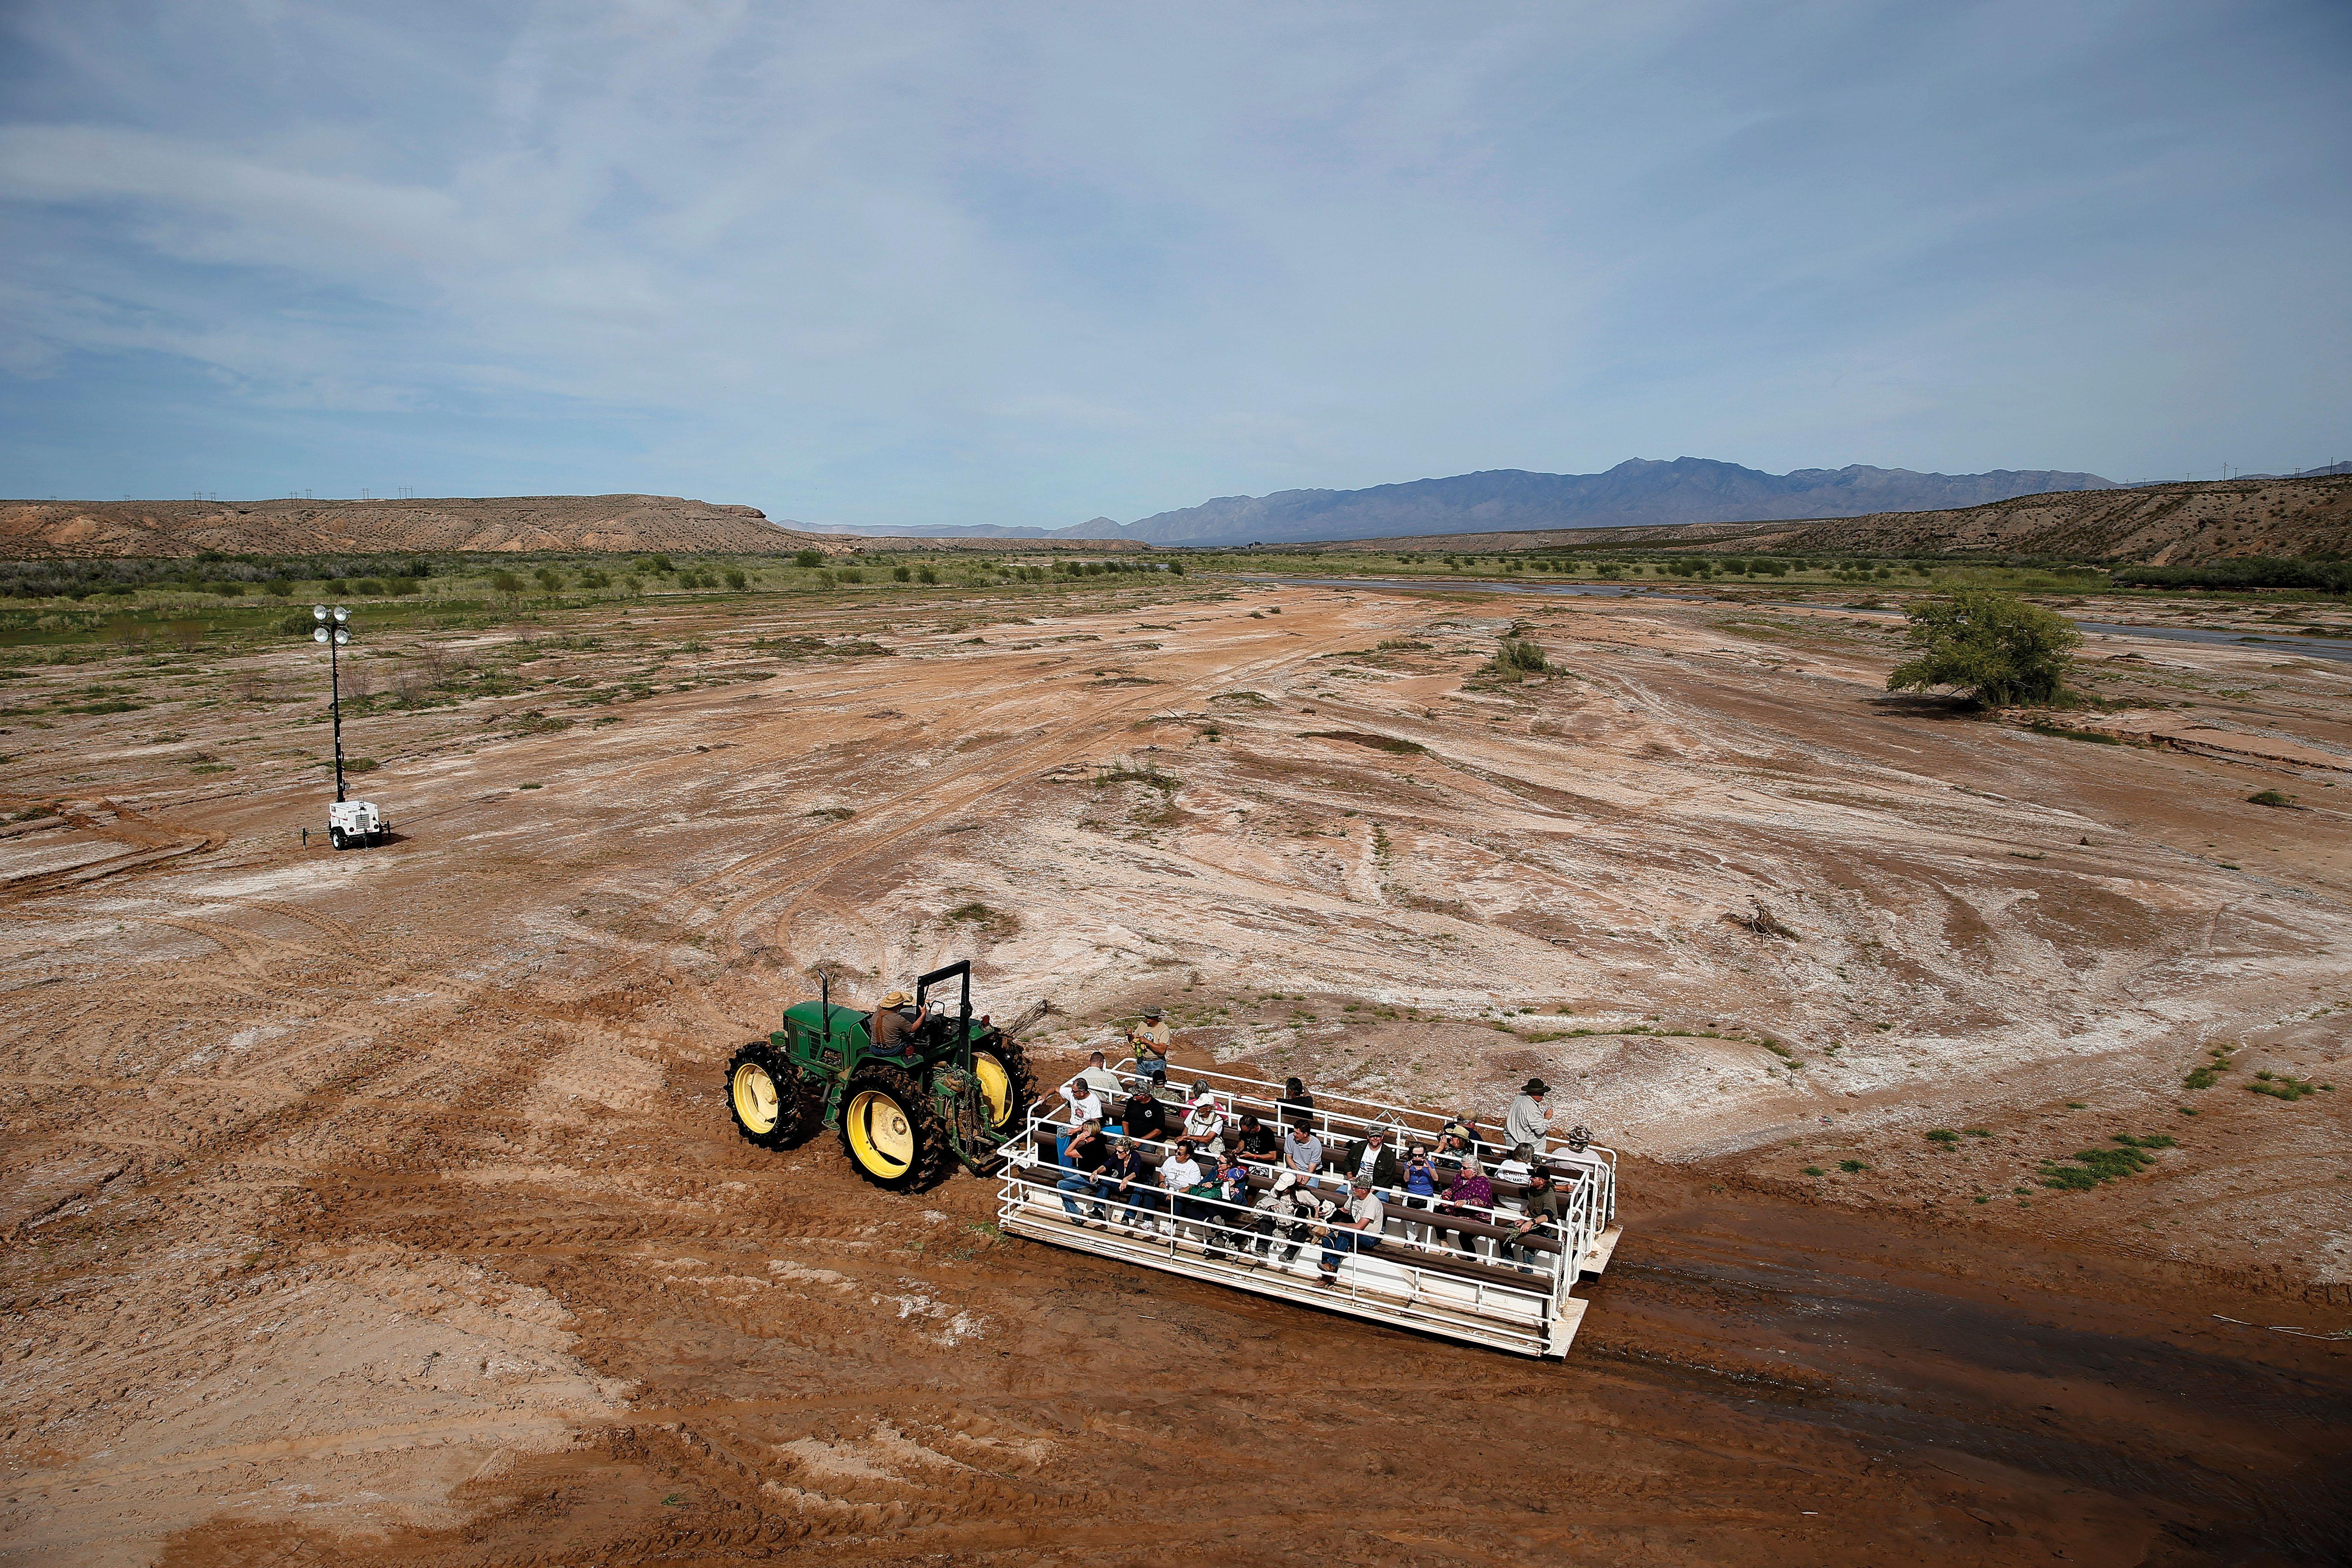 Bundy supporters arrive via tractor